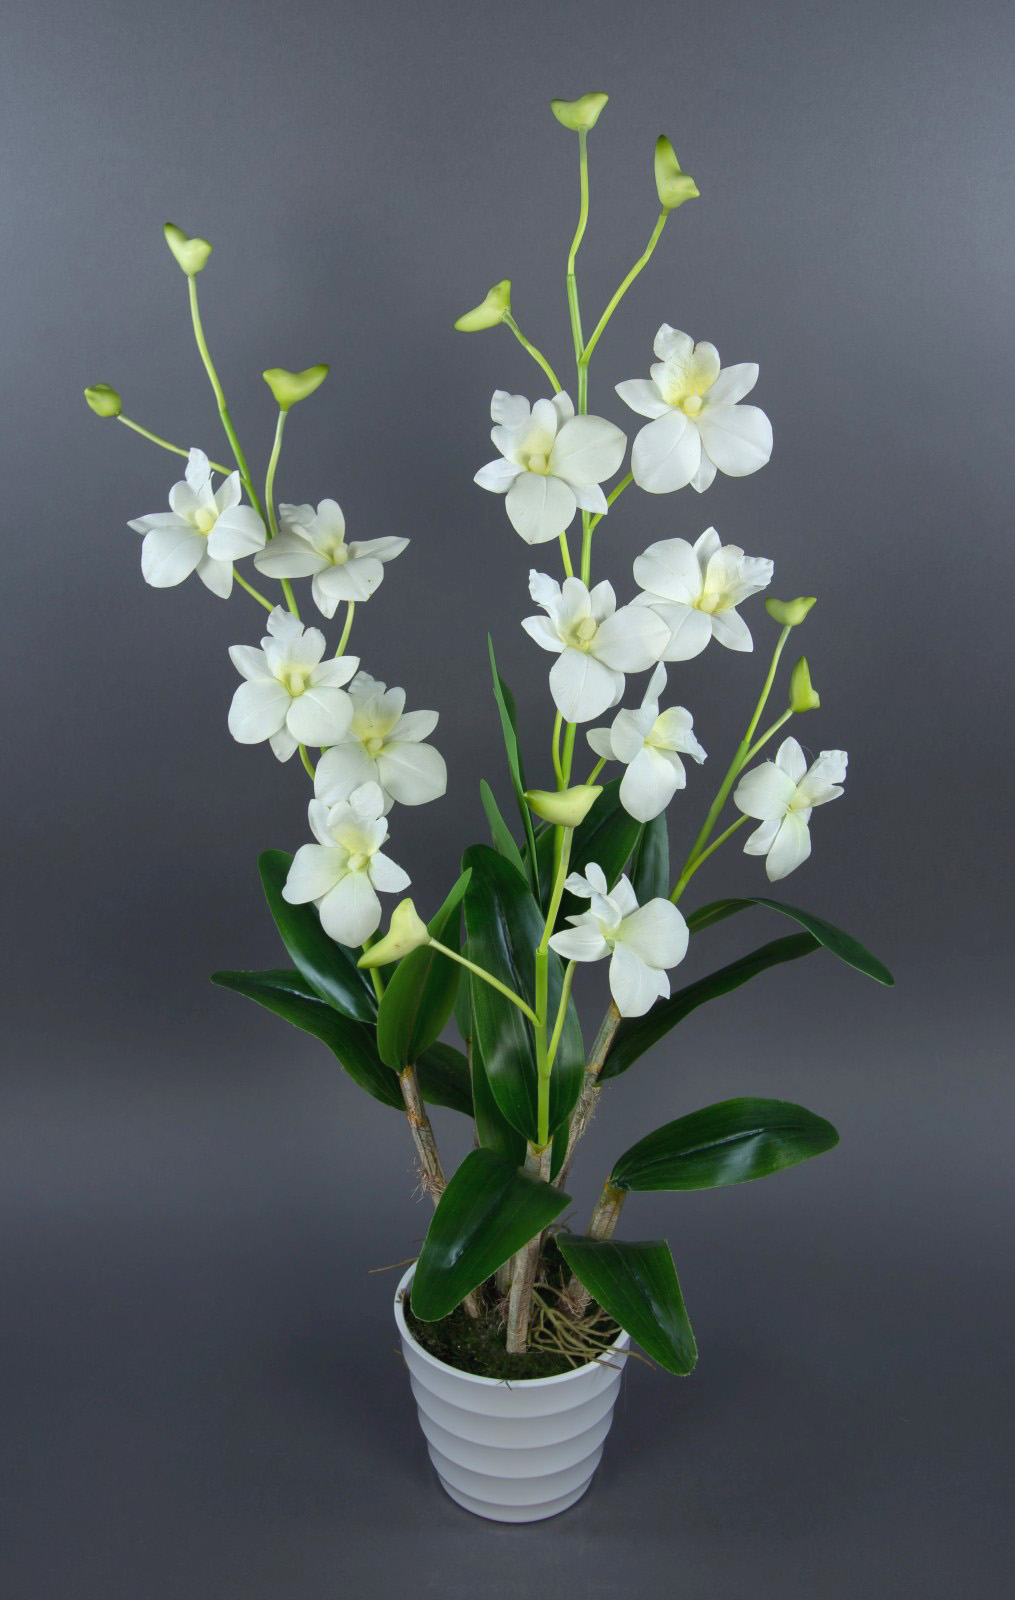 orchidee dendrobium 75x35cm wei creme im wei en dekotopf ga kunstblumen ebay. Black Bedroom Furniture Sets. Home Design Ideas